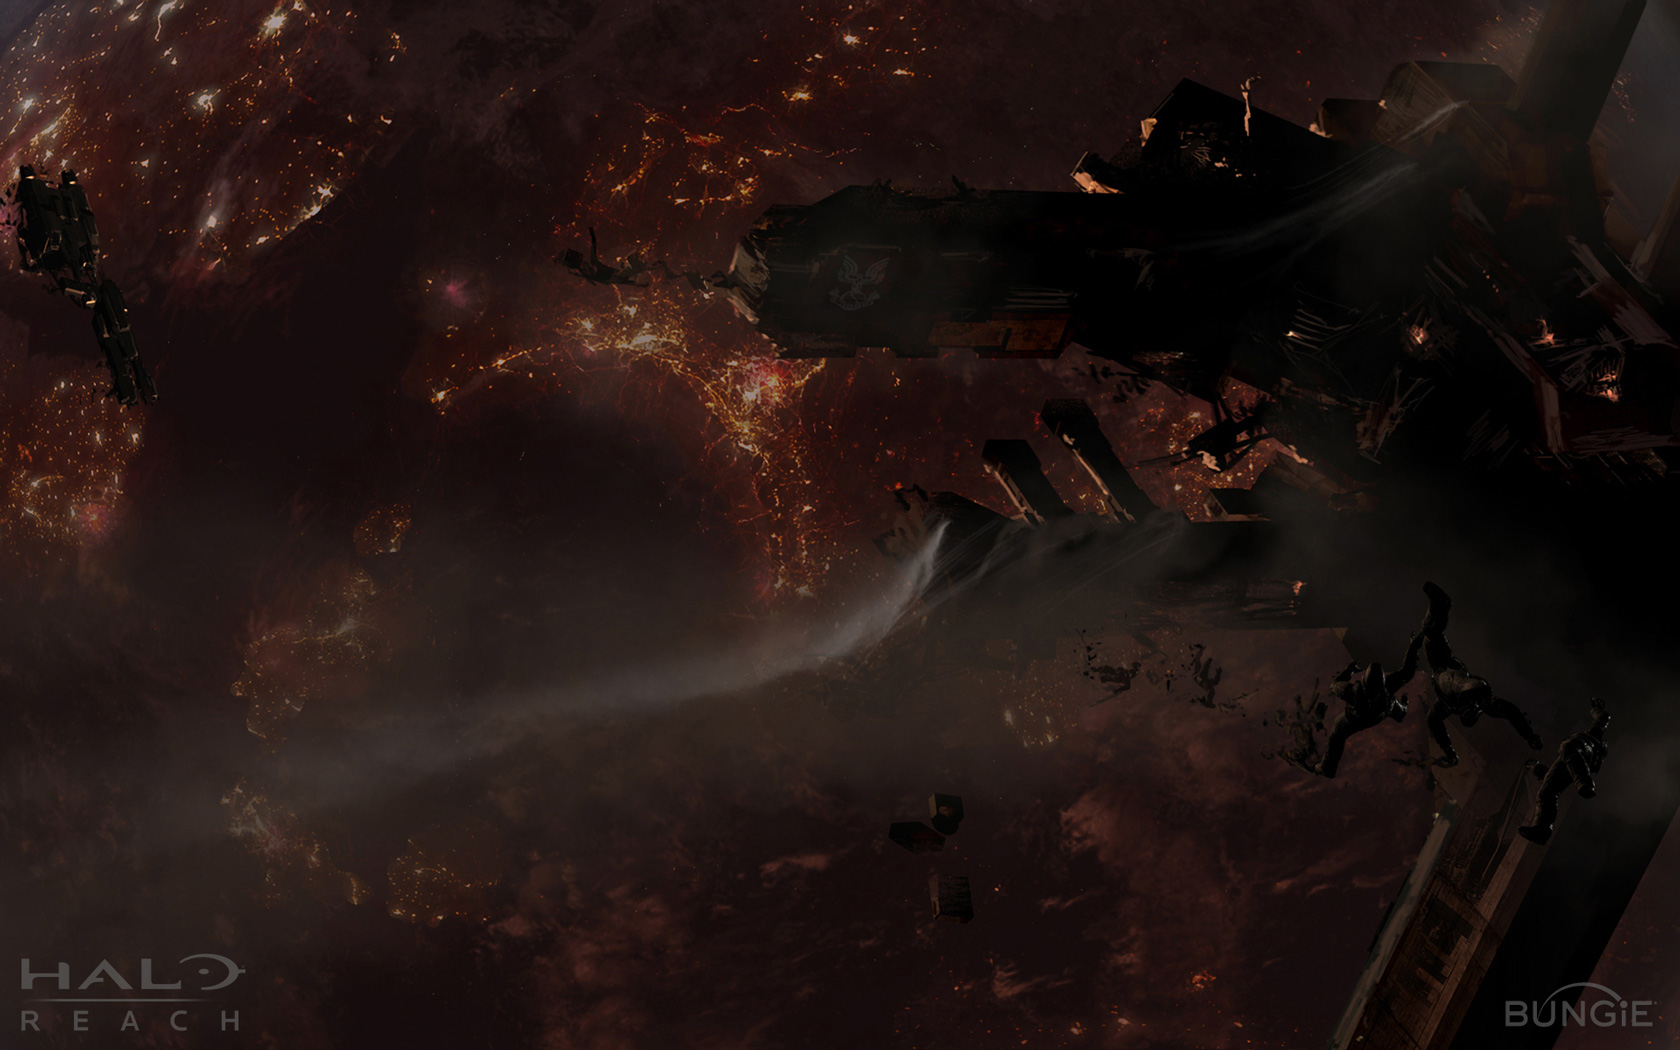 Halo: Reach Wallpaper in 1680x1050